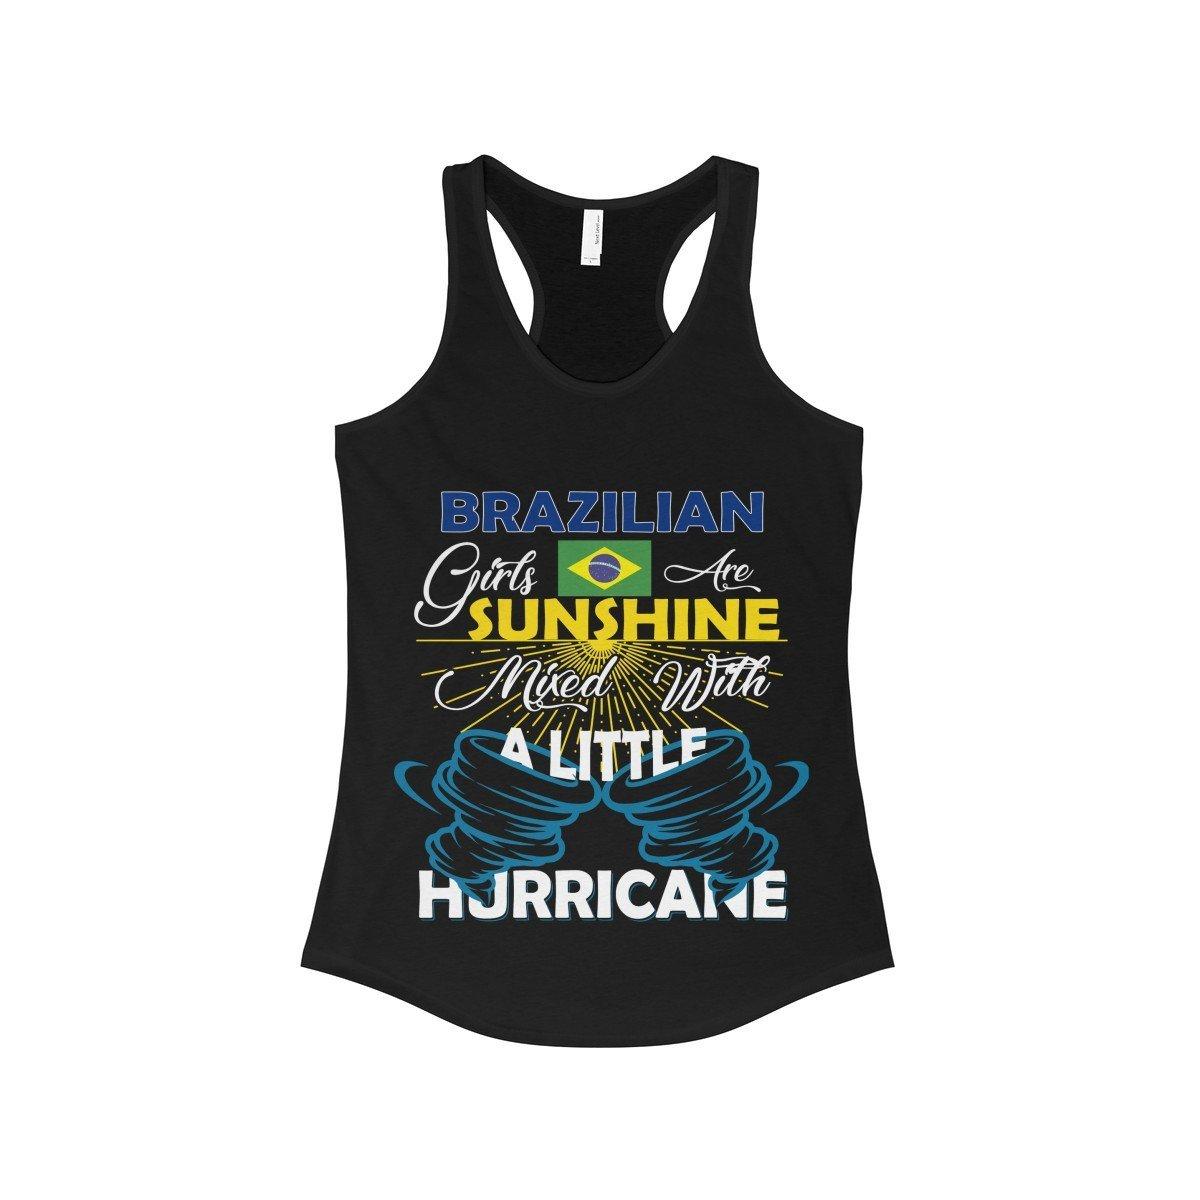 FavoryStore Brazilian Girls Are Sunshine Mixed With a Little Hurricane Shirt Tank Top